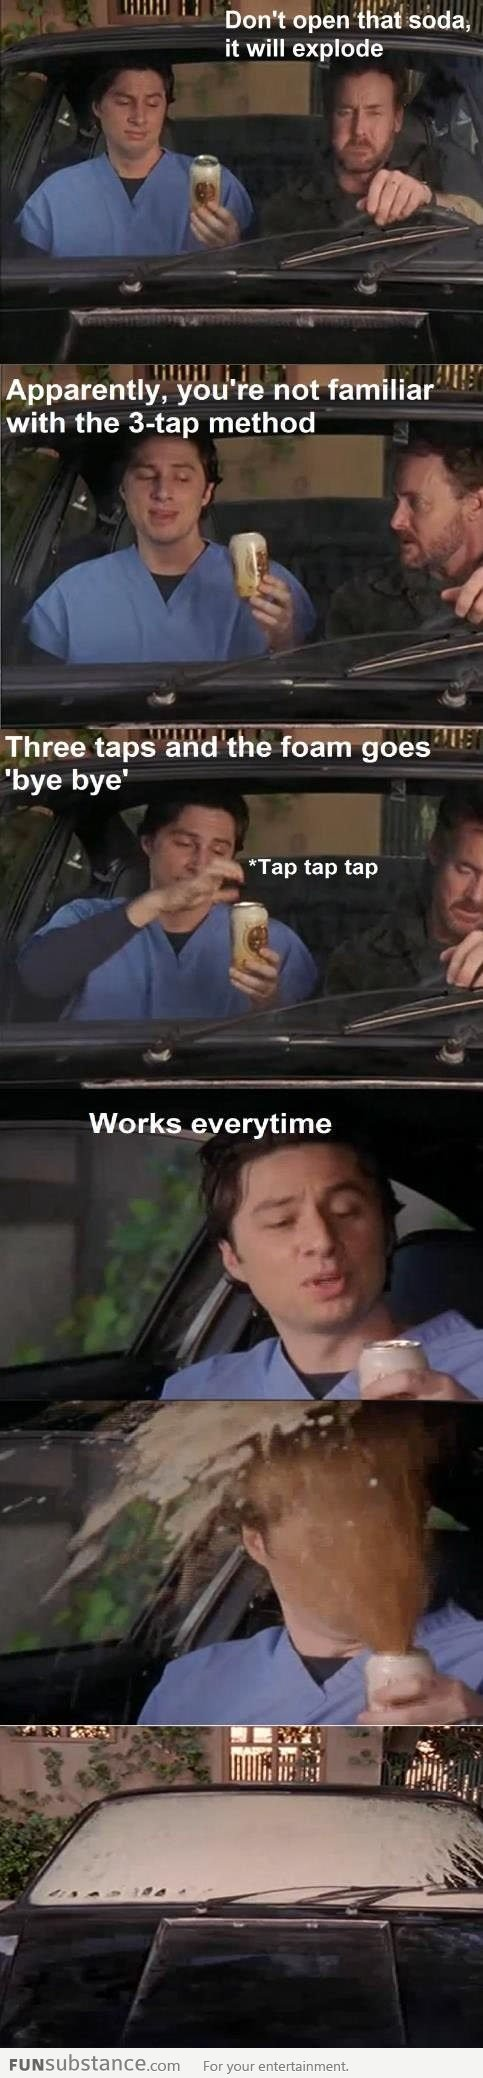 I do the three tap method...